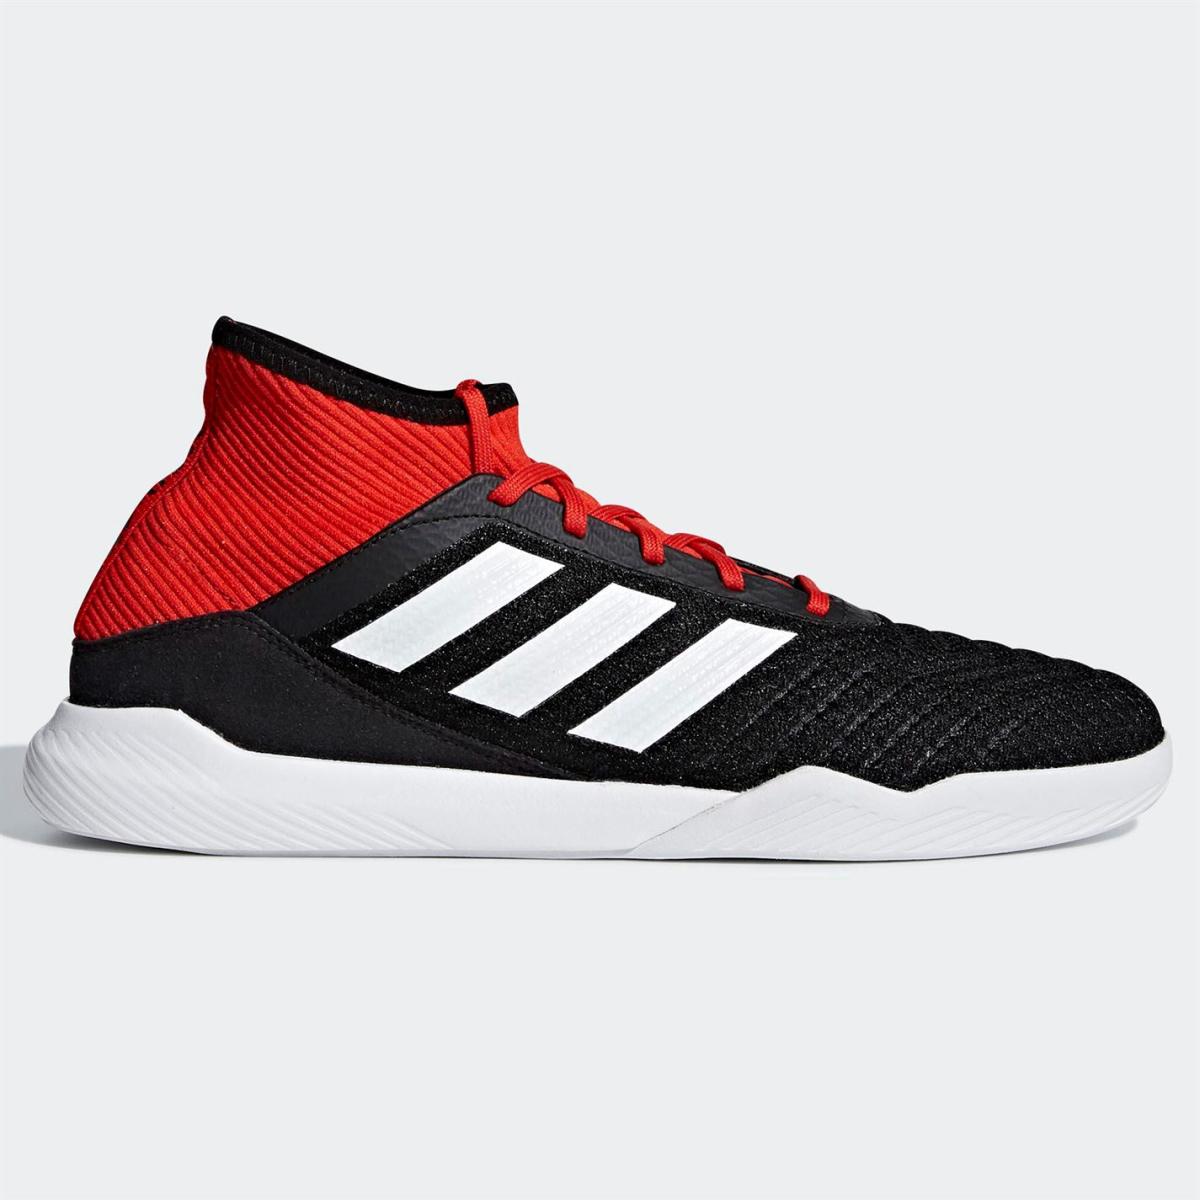 adidas Predator Tango 18.3 Herren Hallenschuhe Schuhe Schwarz_Wht_Rot